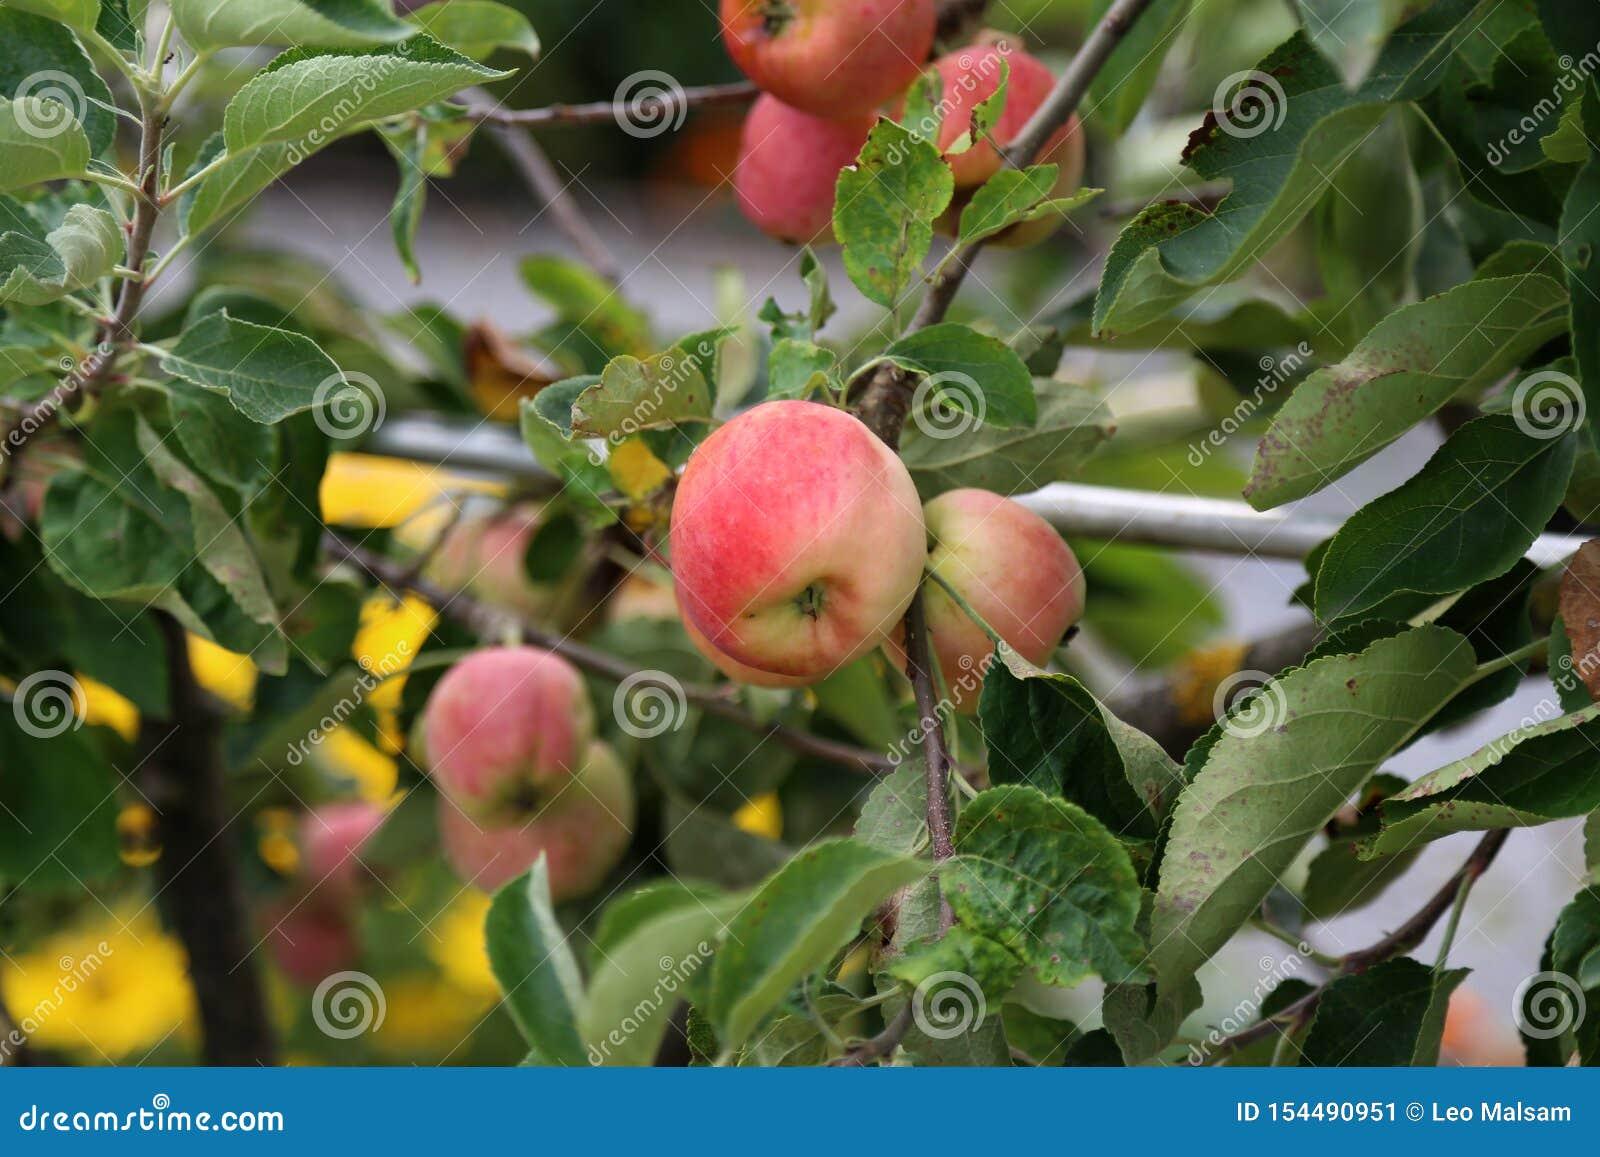 As maçãs amadurecem-se em ramos de árvore no jardim